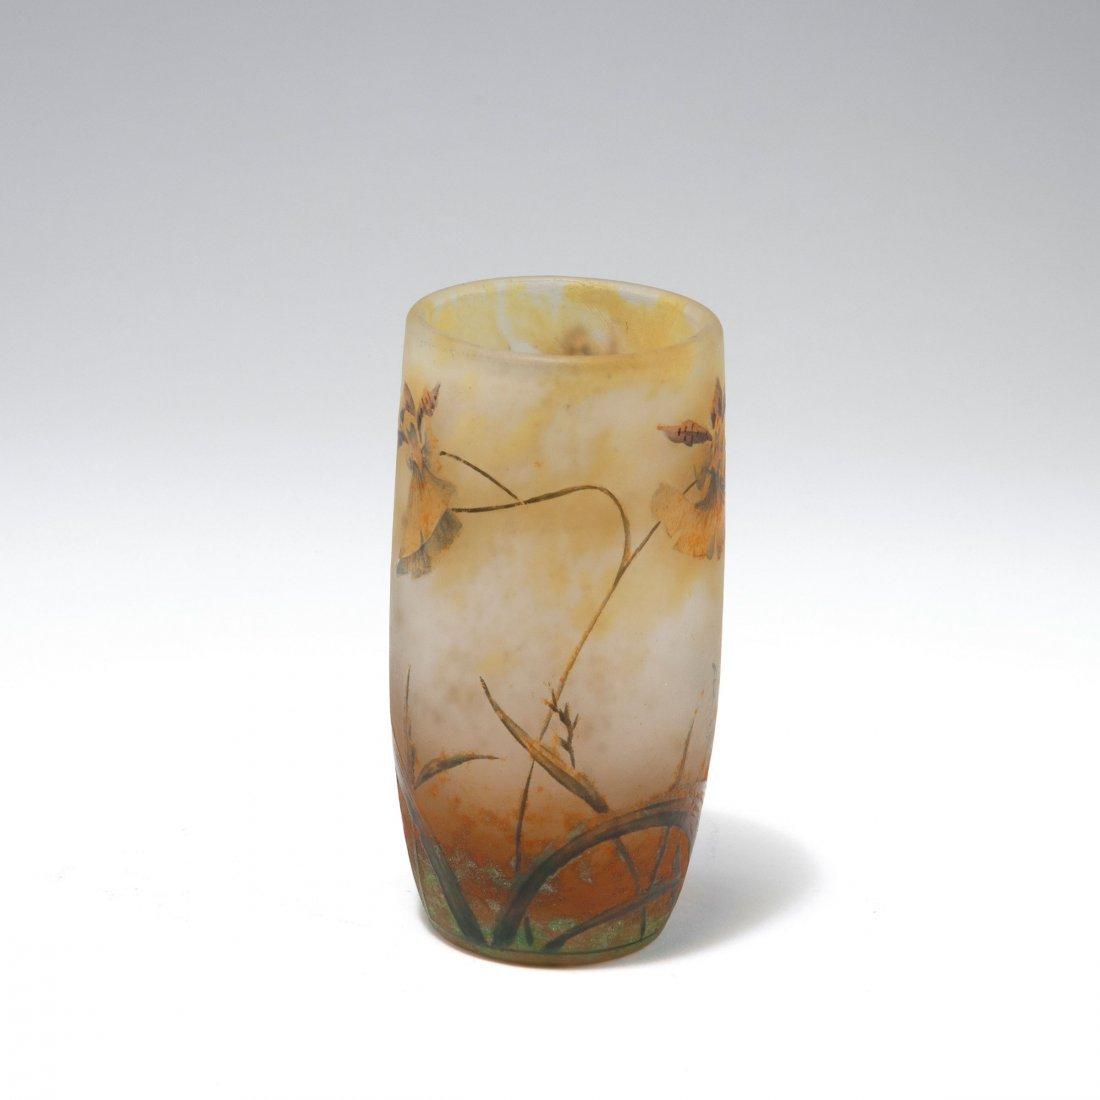 'Orchidees' vase, 1905-10 - 3